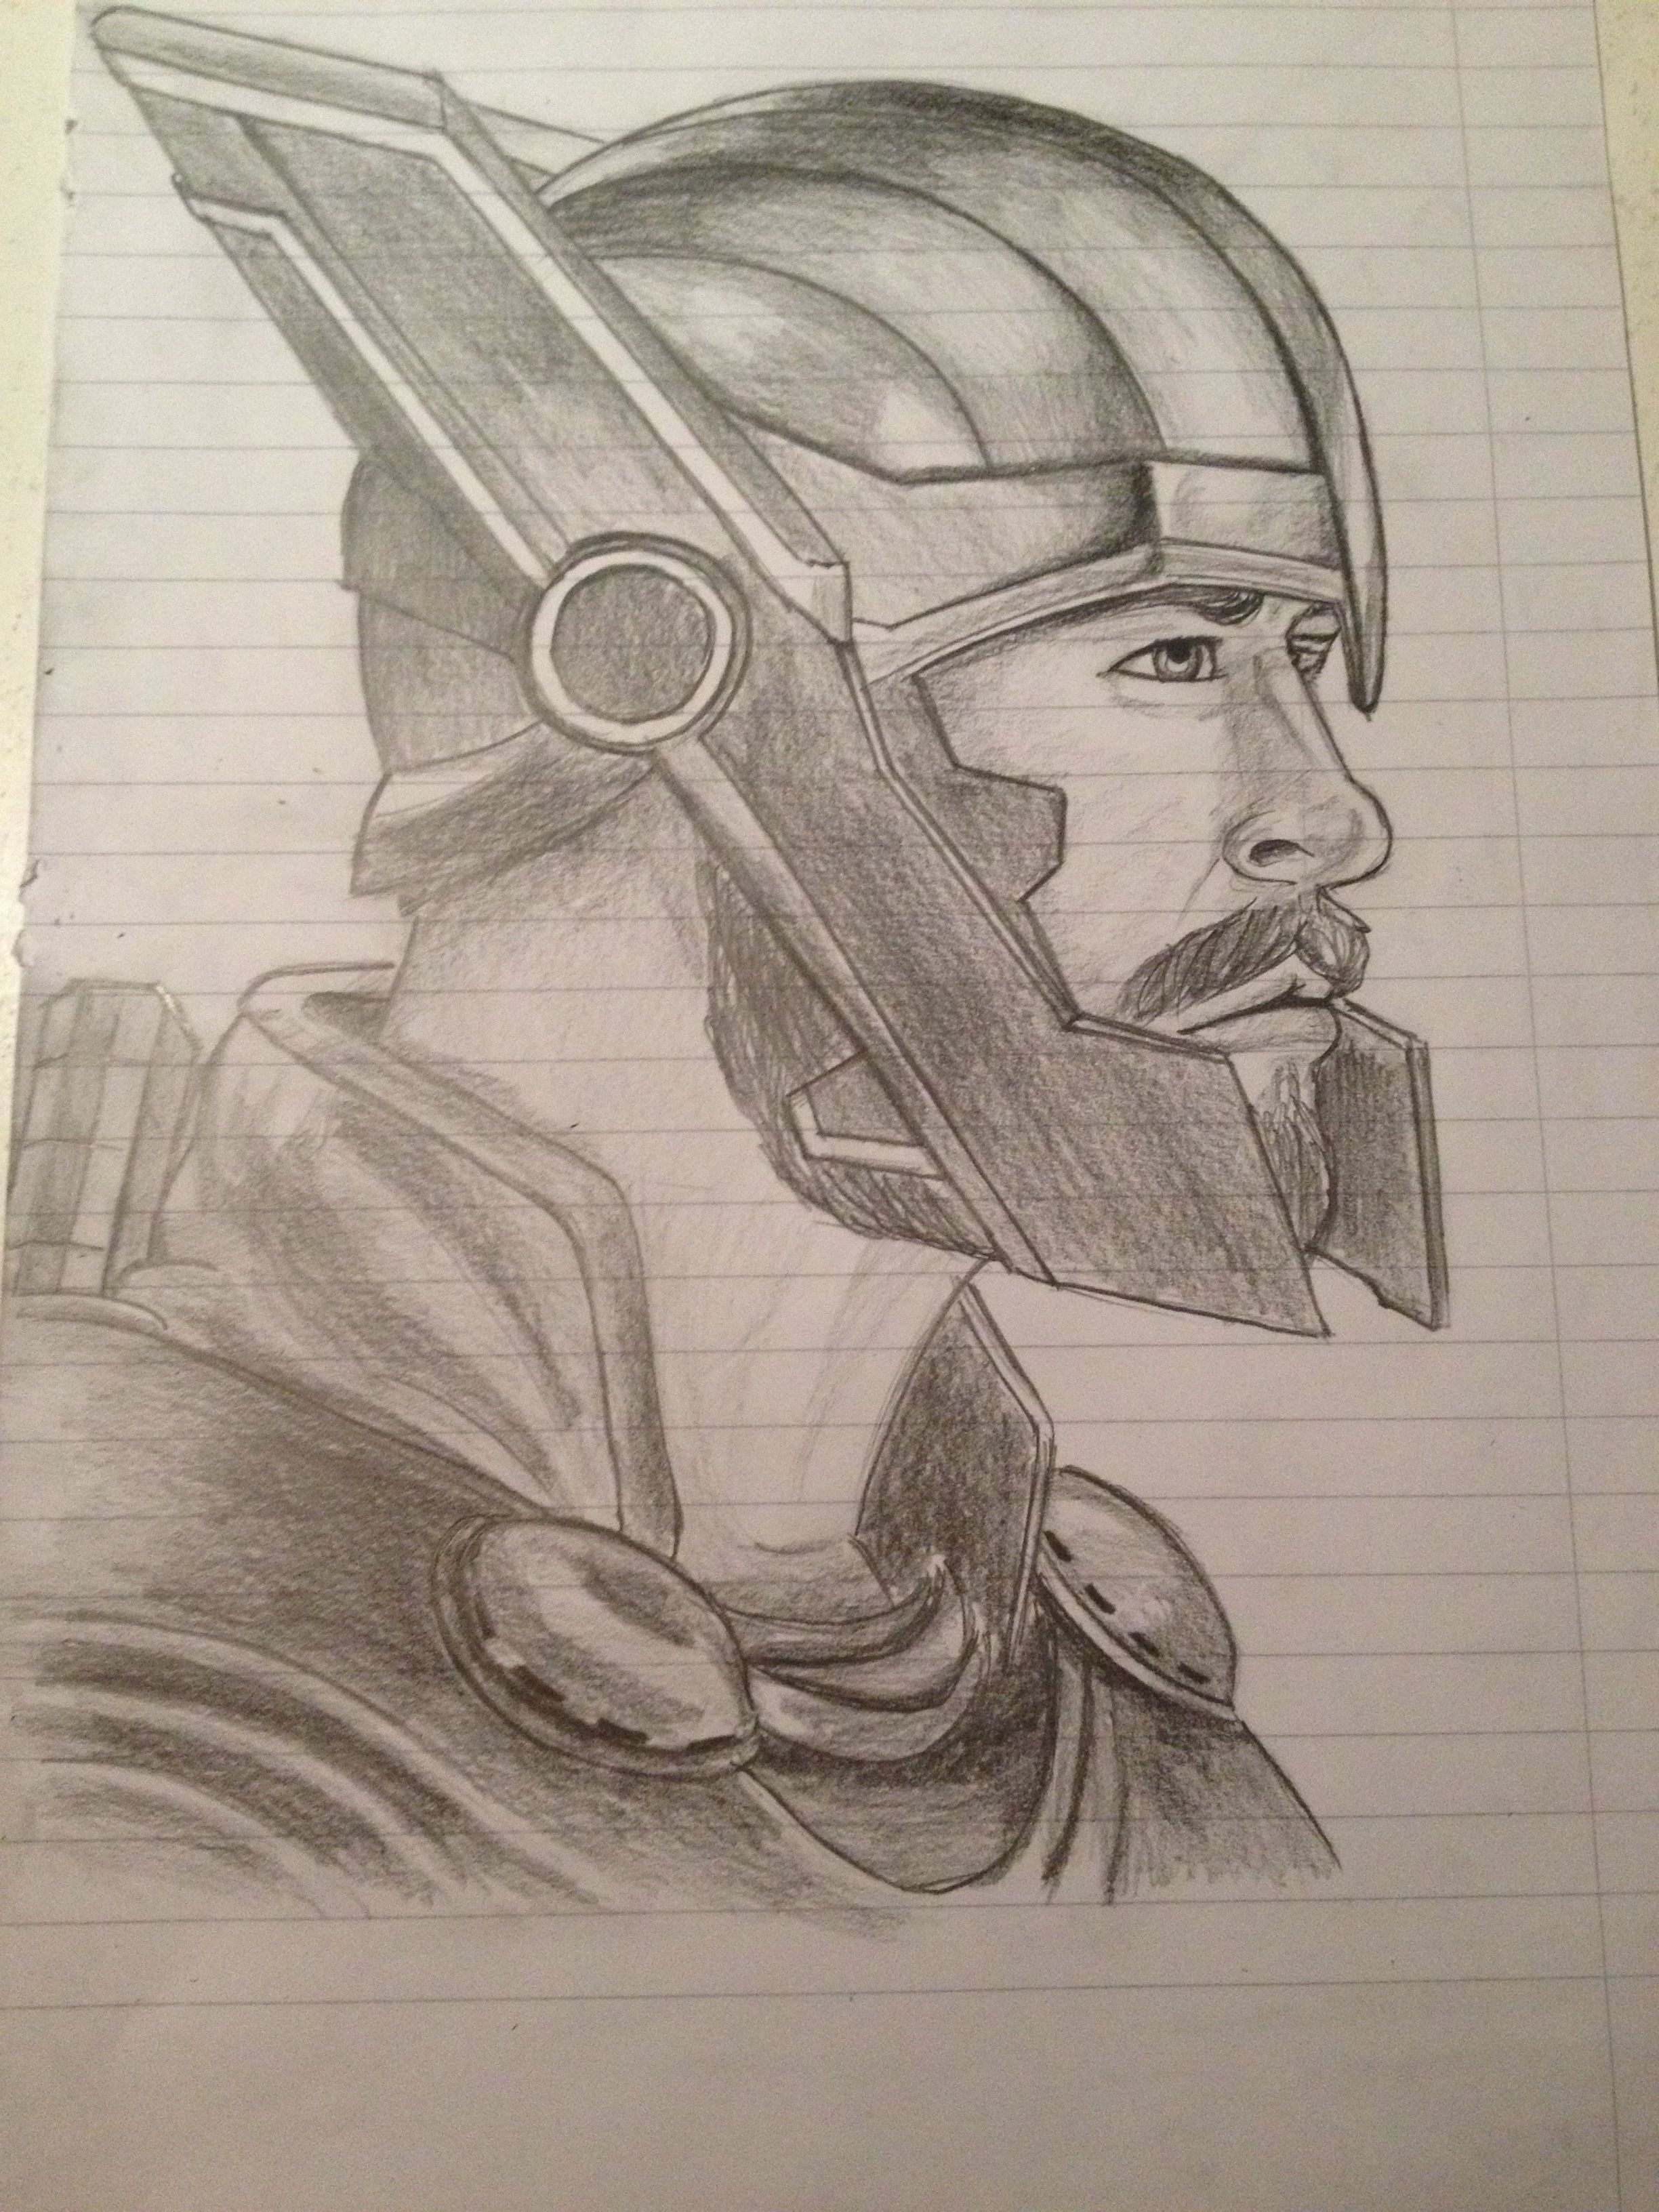 Grigorije S Drawing Of Thor Ragnarok Marvel Drawings Marvel Art Drawings Spiderman Art Sketch